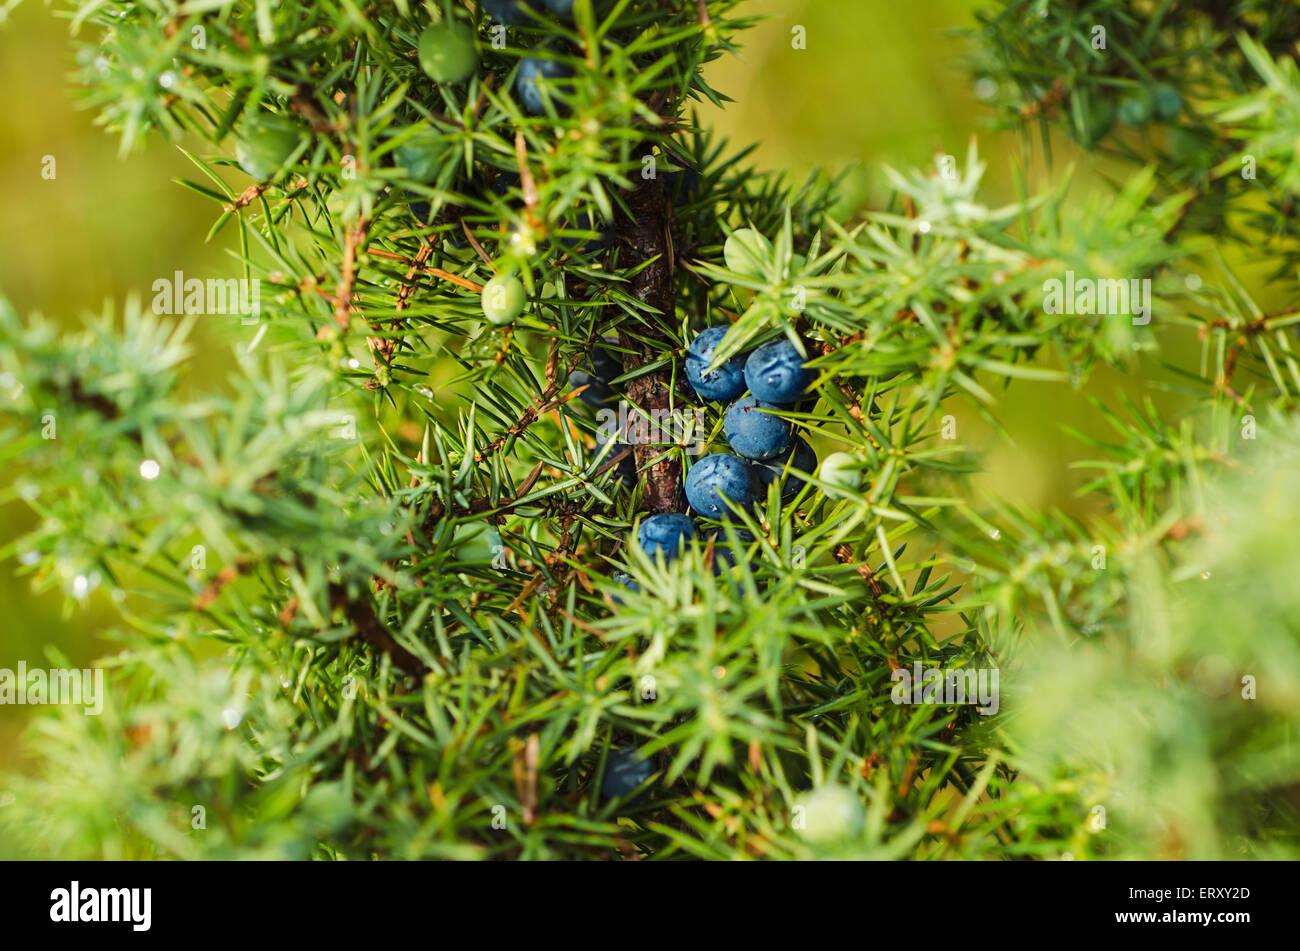 Juniper berries on the tree - Stock Image